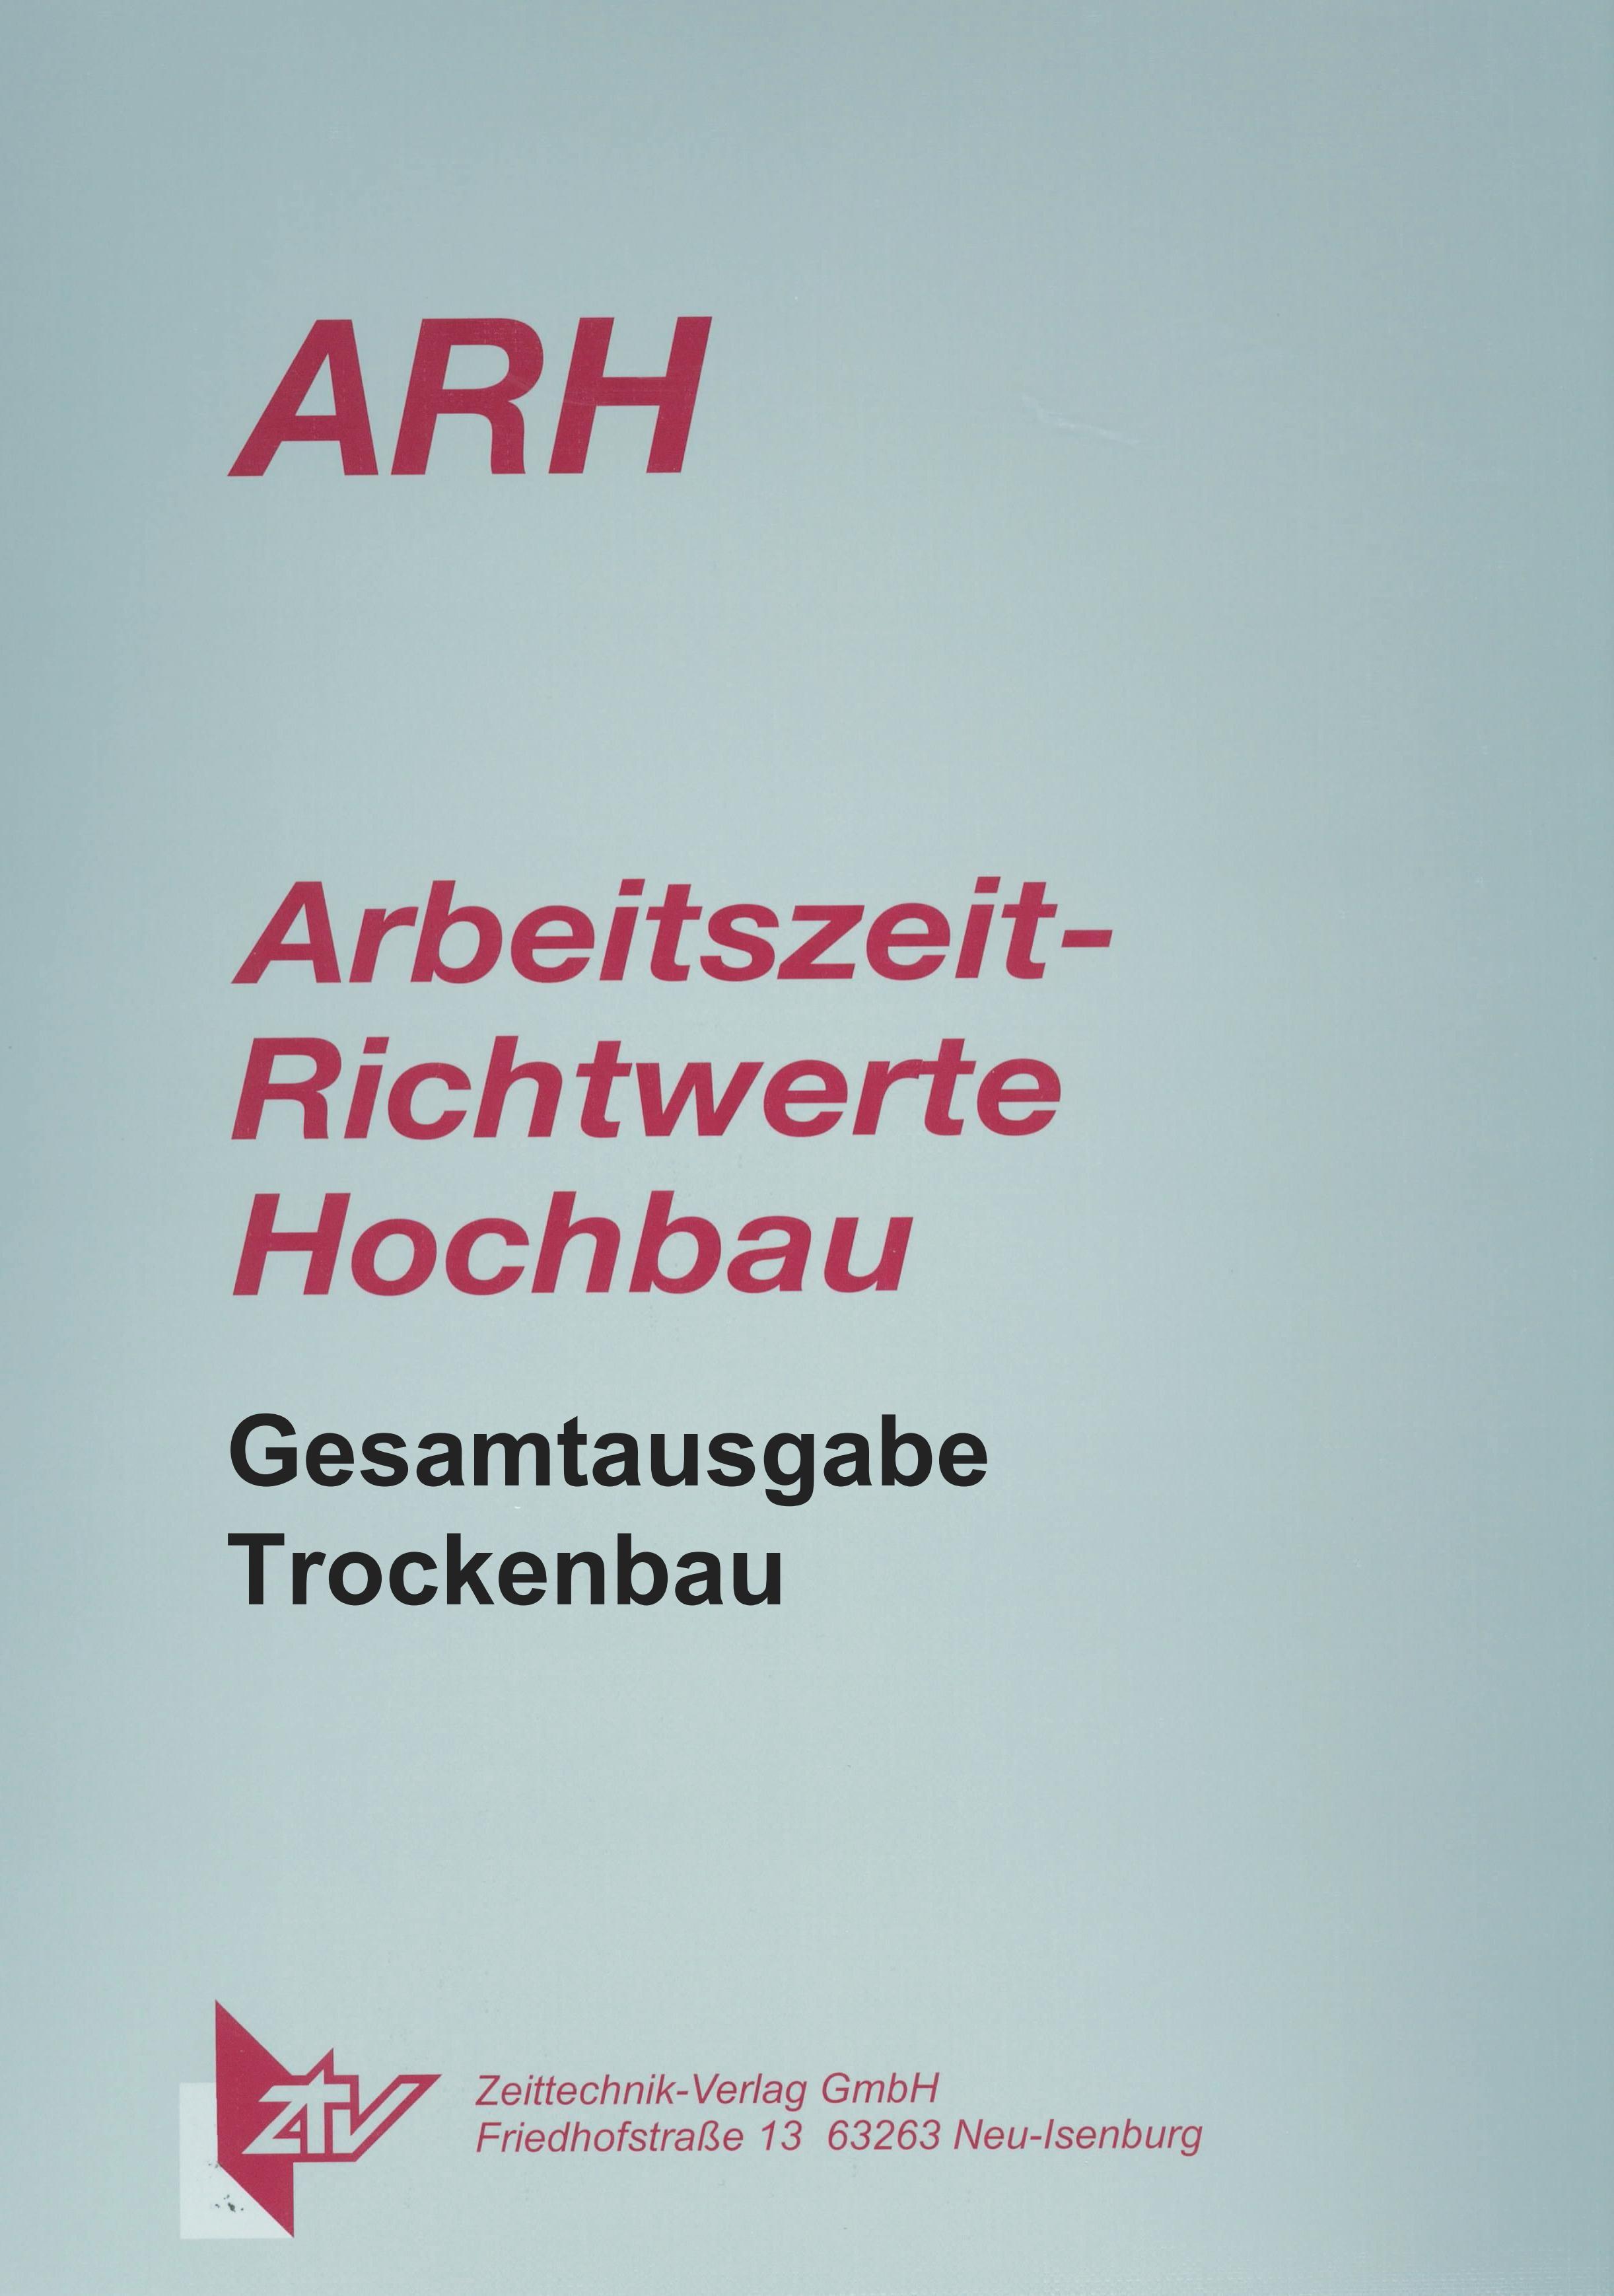 ARH-Tabellen Trockenbau - Gesamtausgabe